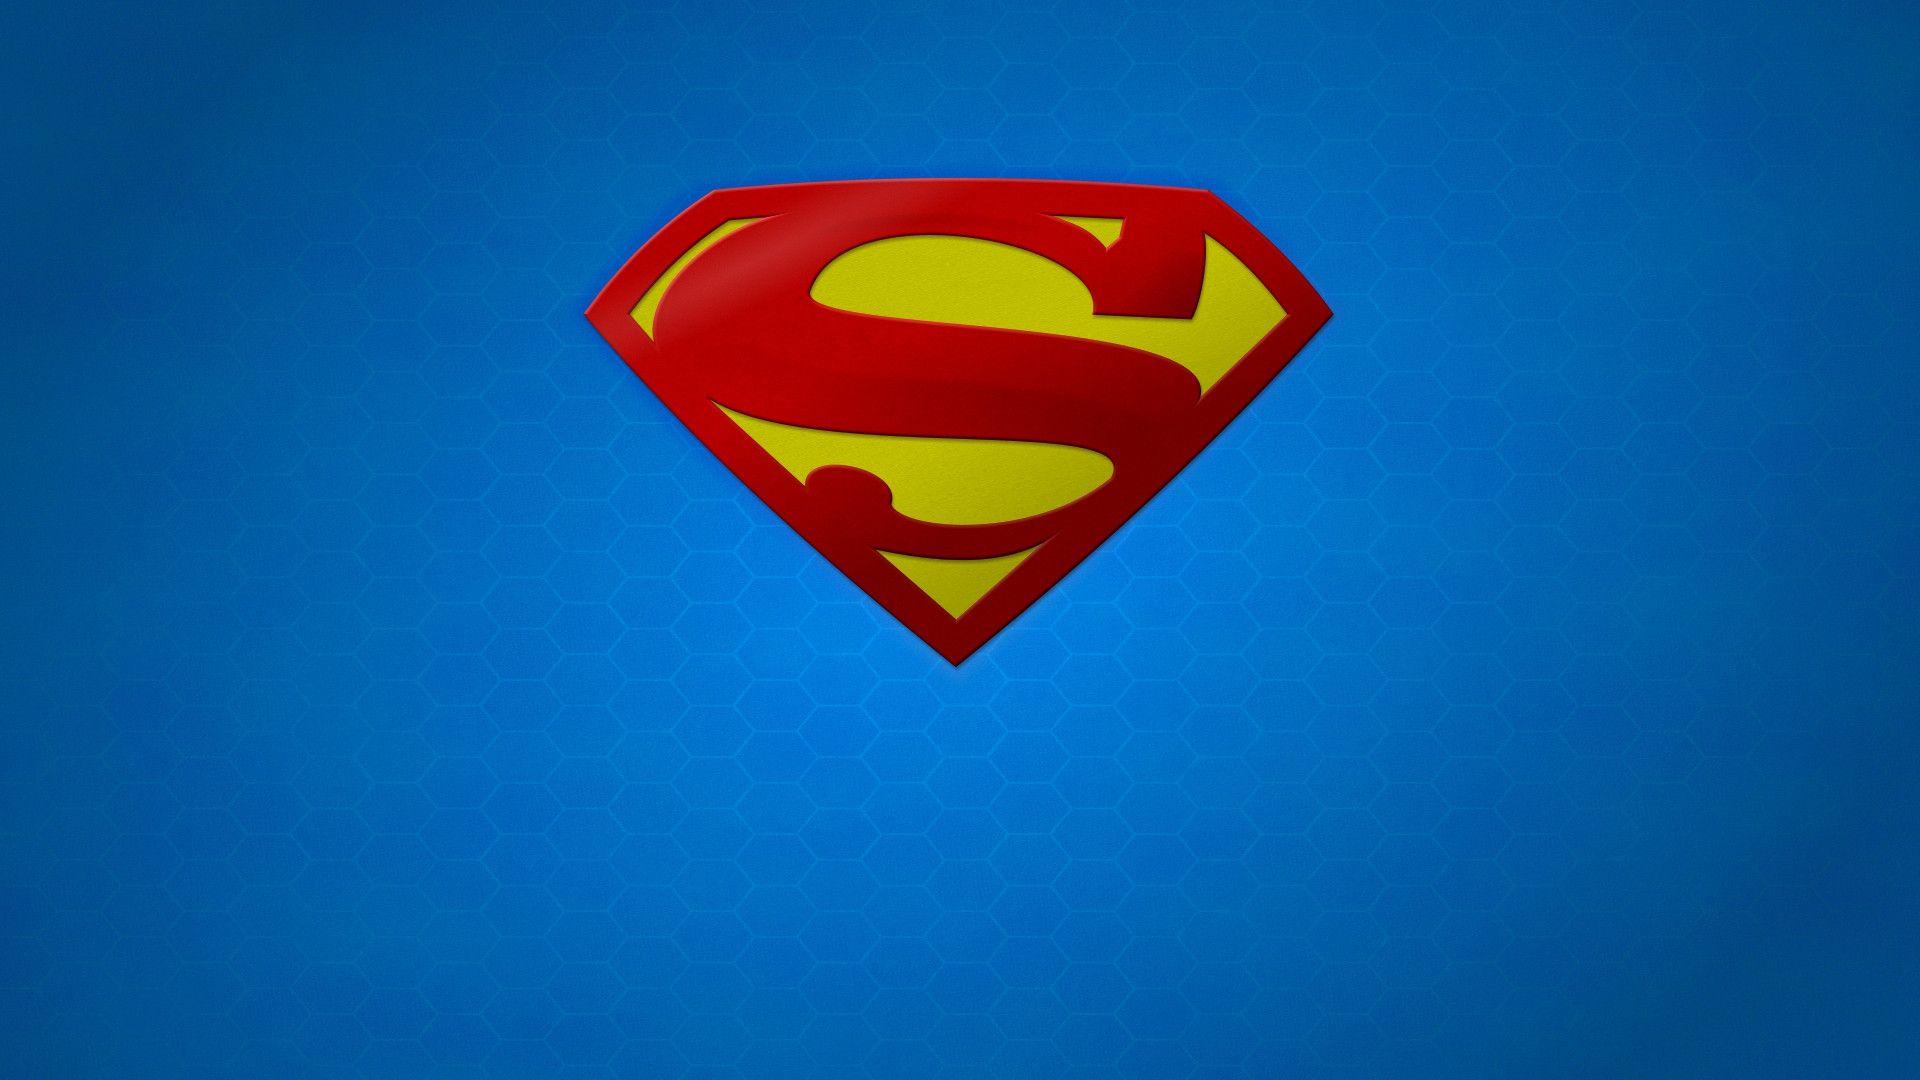 Superman Wallpapers P Wallpaper 1920x1080